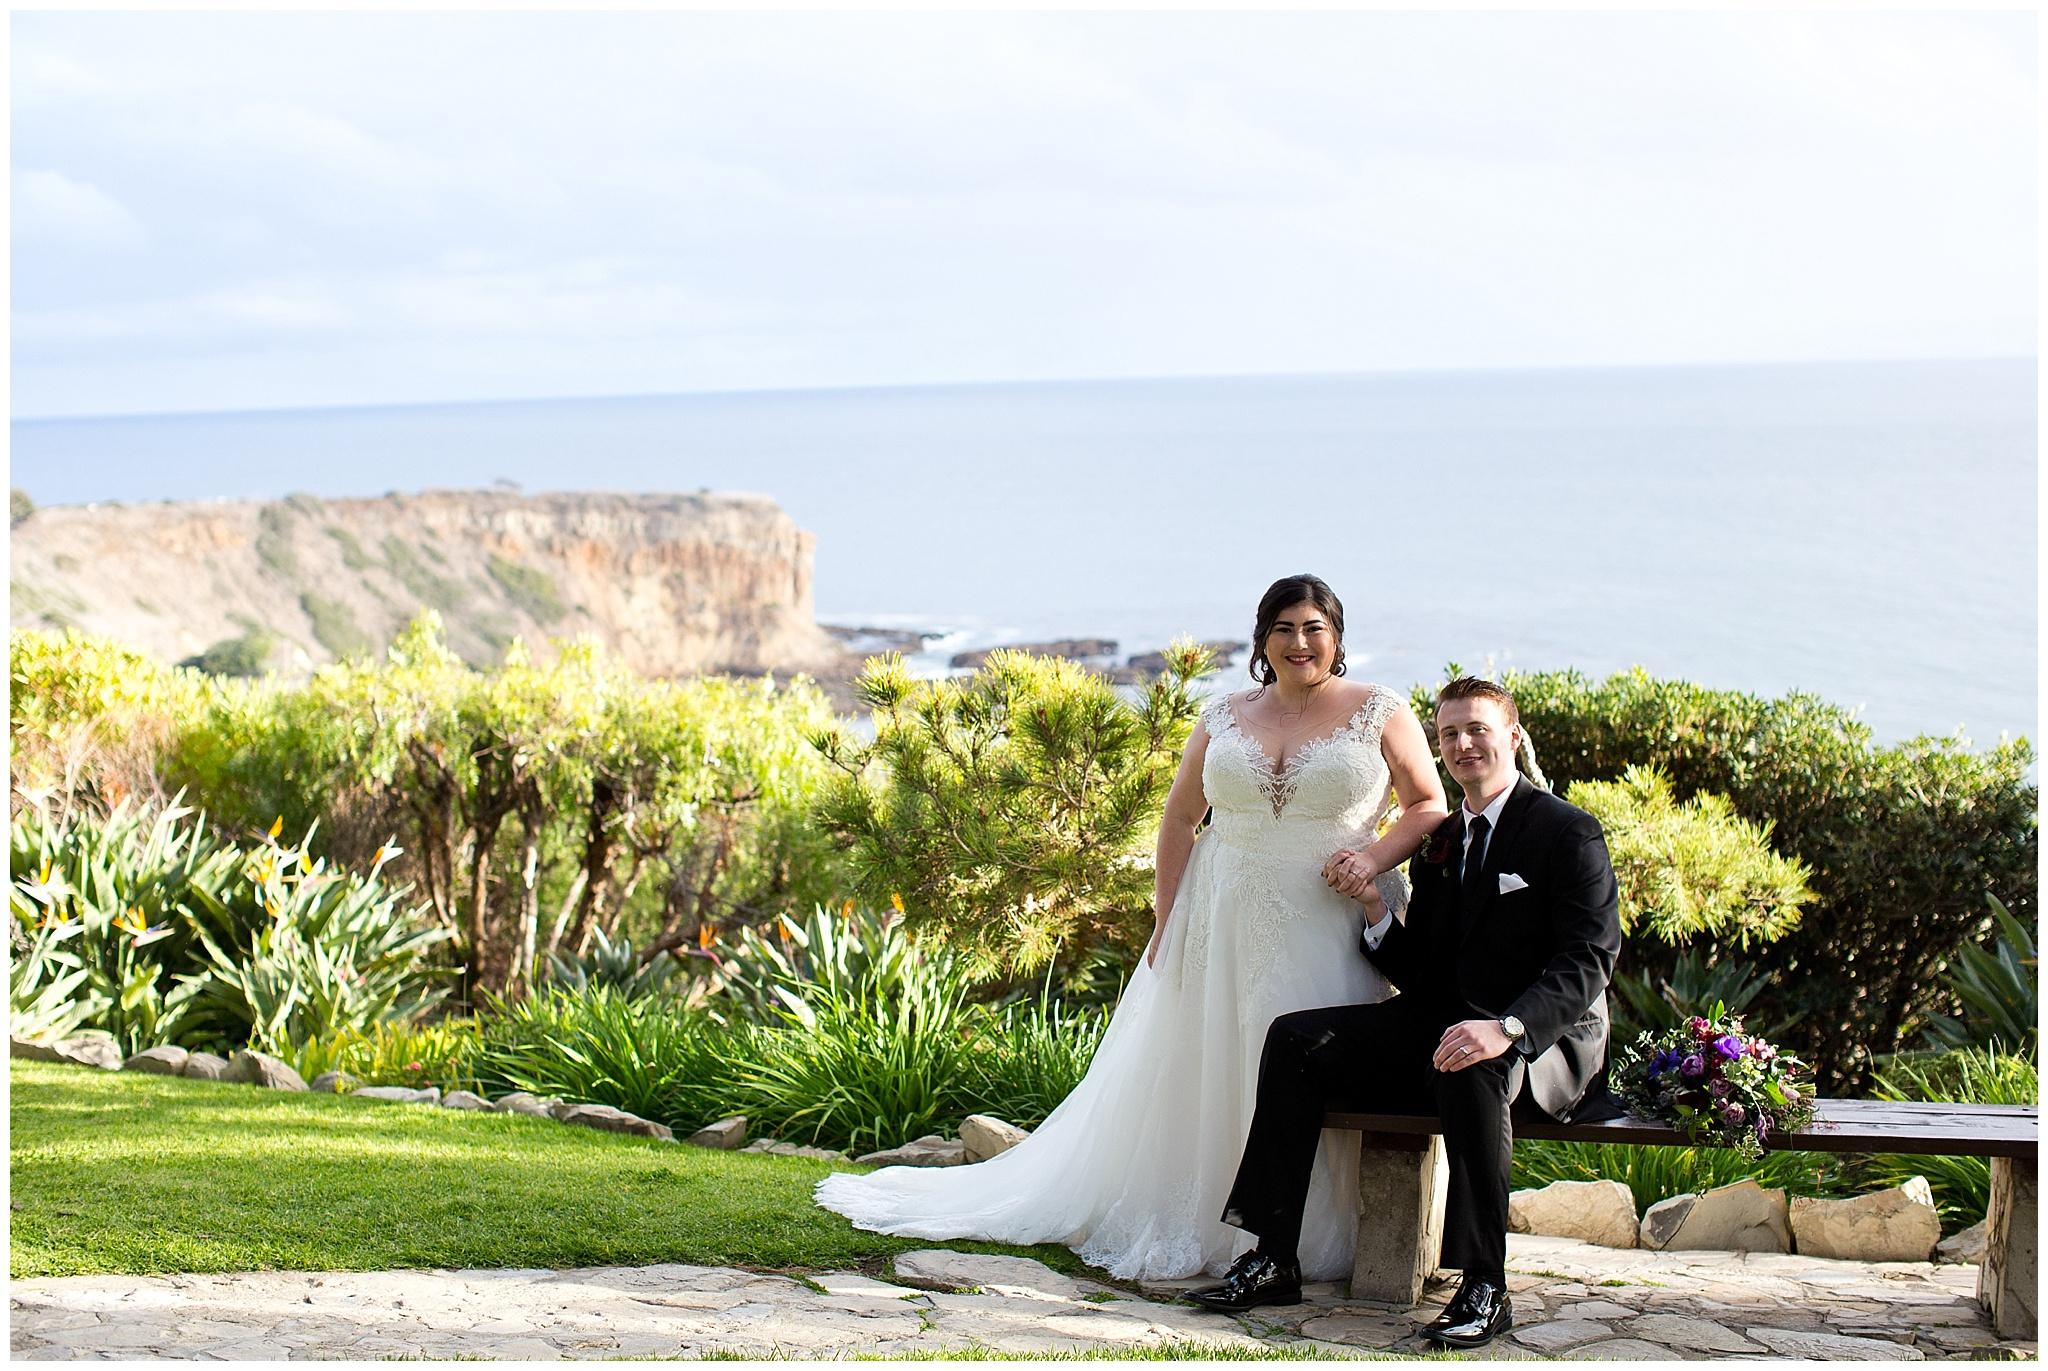 Carol_and_Grant_Wedding_3-3-18-8262.jpg